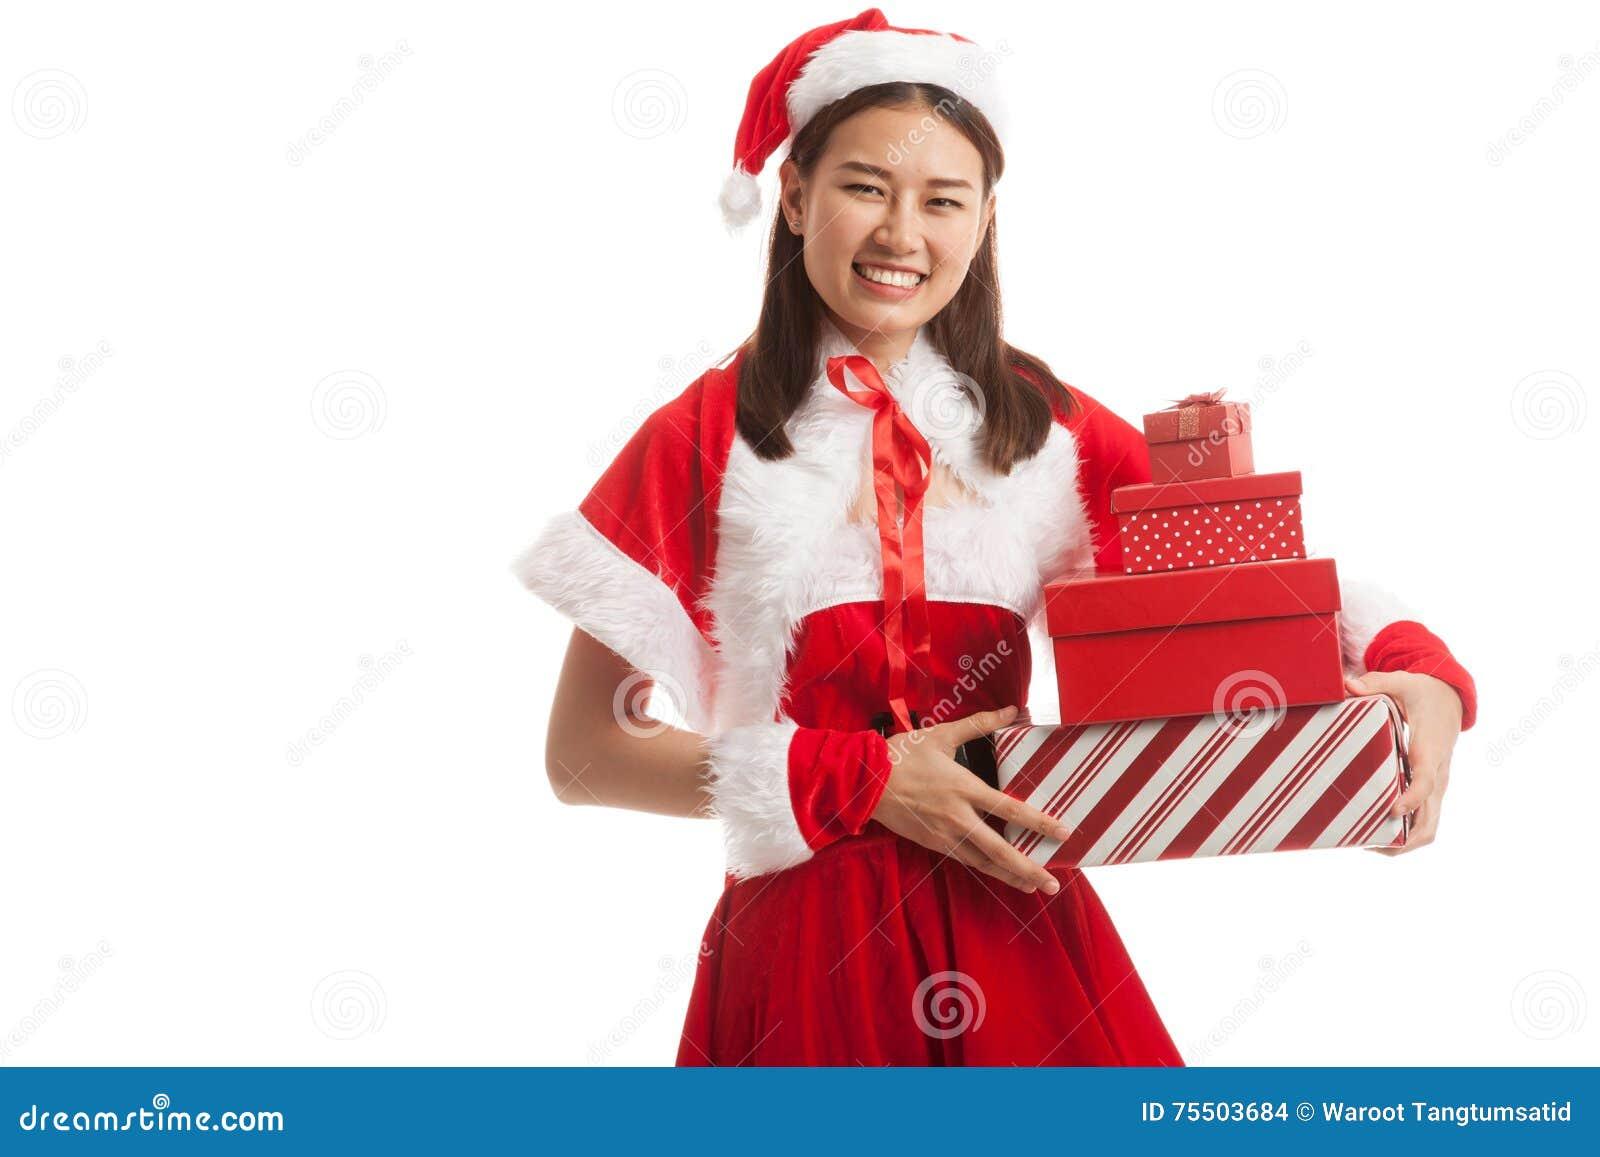 Asian Christmas Santa Claus girl with gift boxs